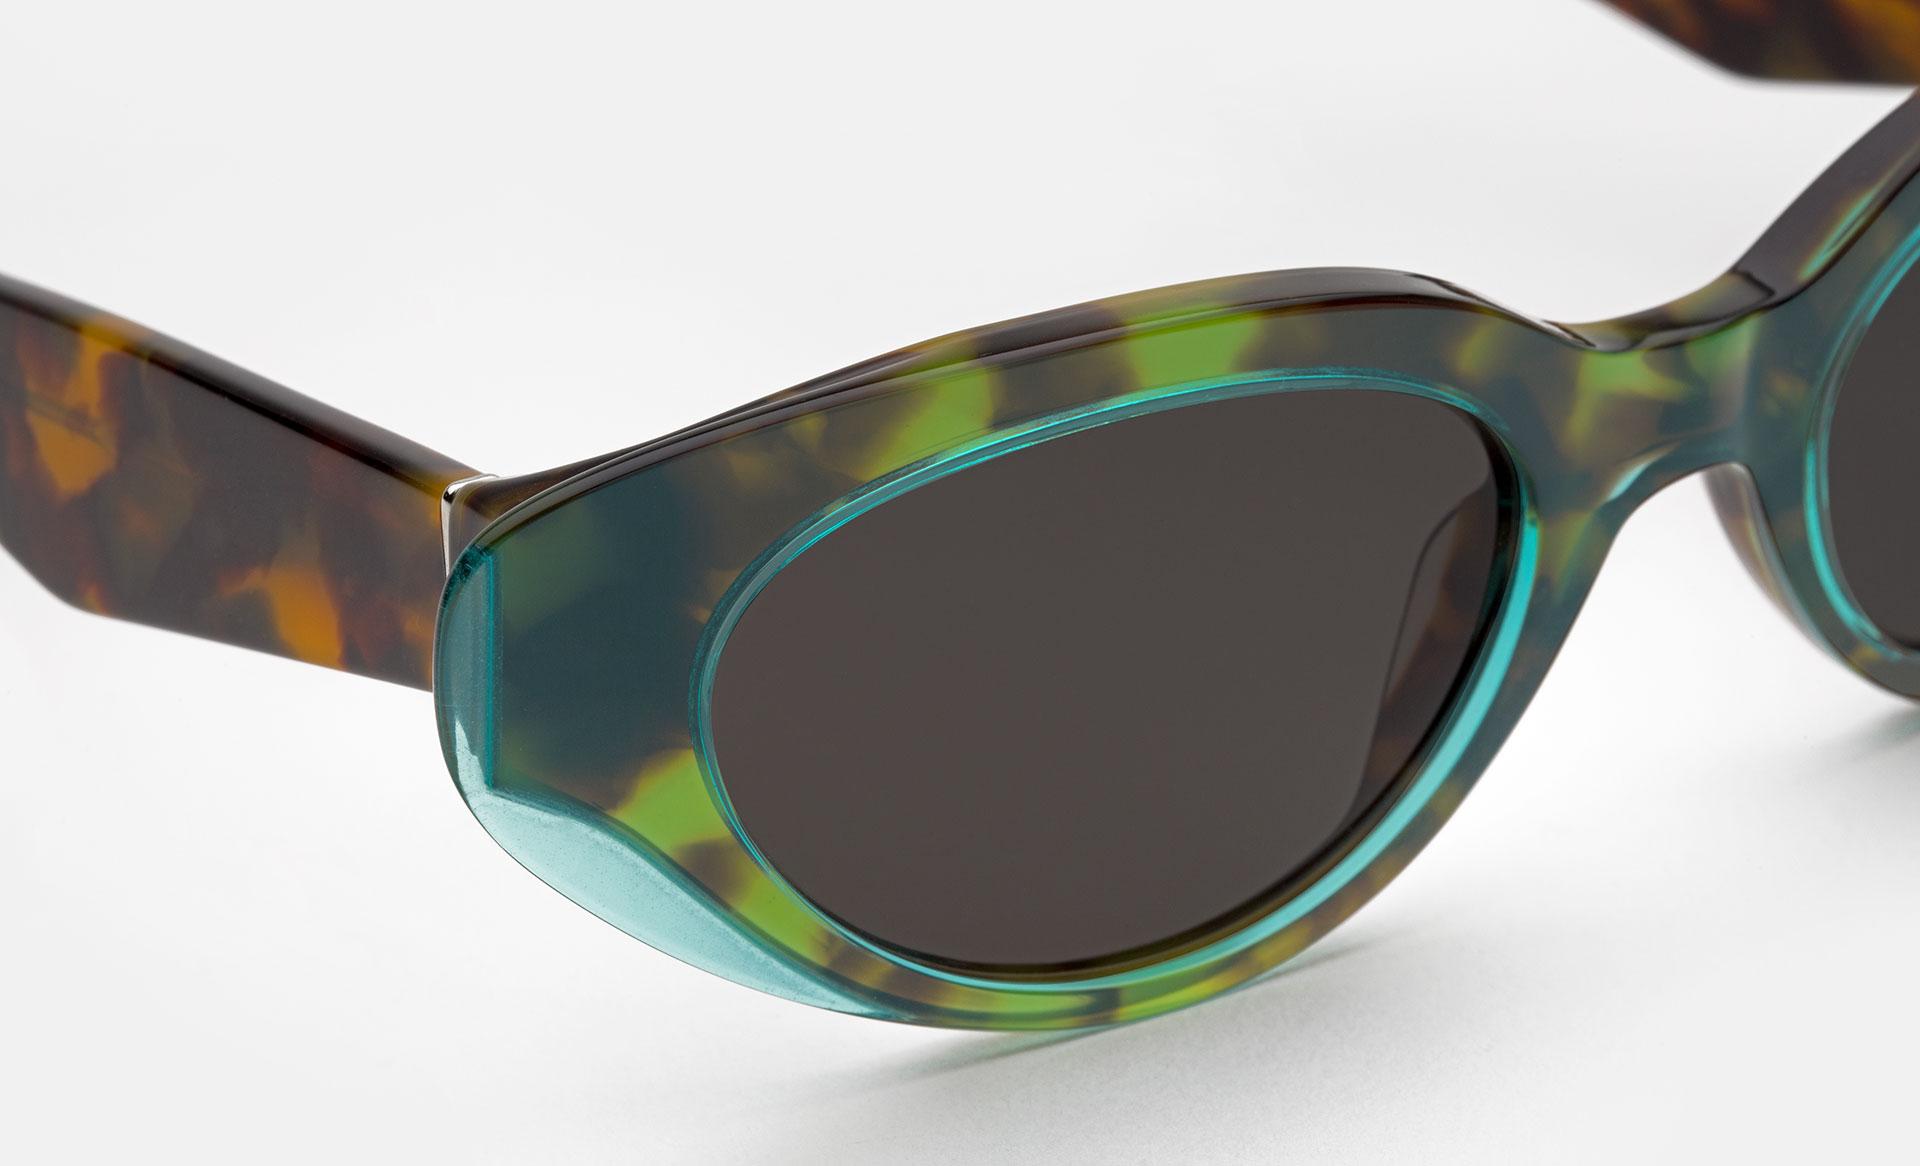 Ragazza Wet Turquoise Acetate Close Up